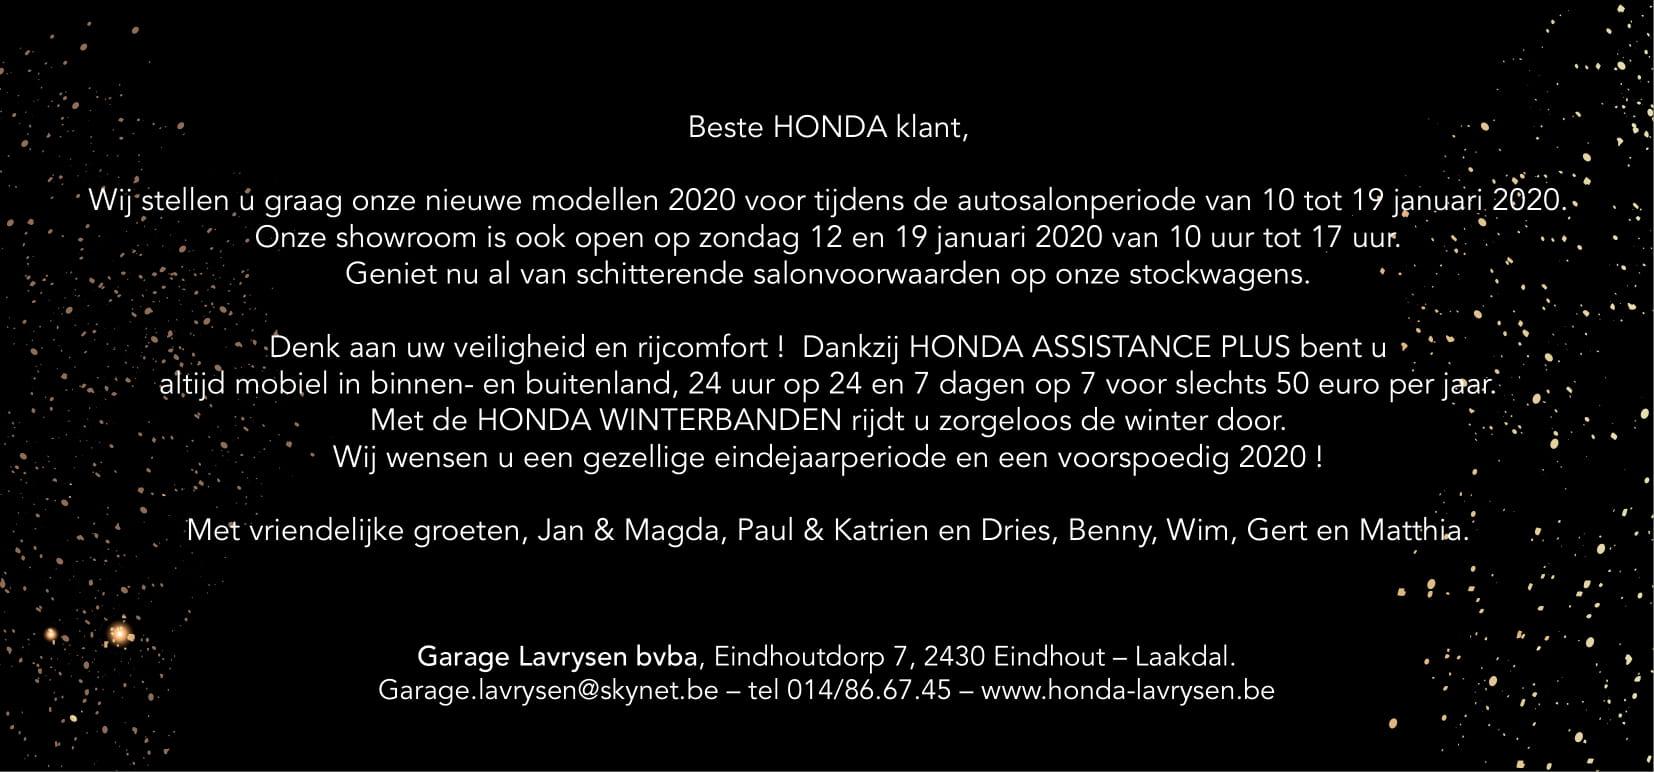 KK_Honda_2019-2.jpg